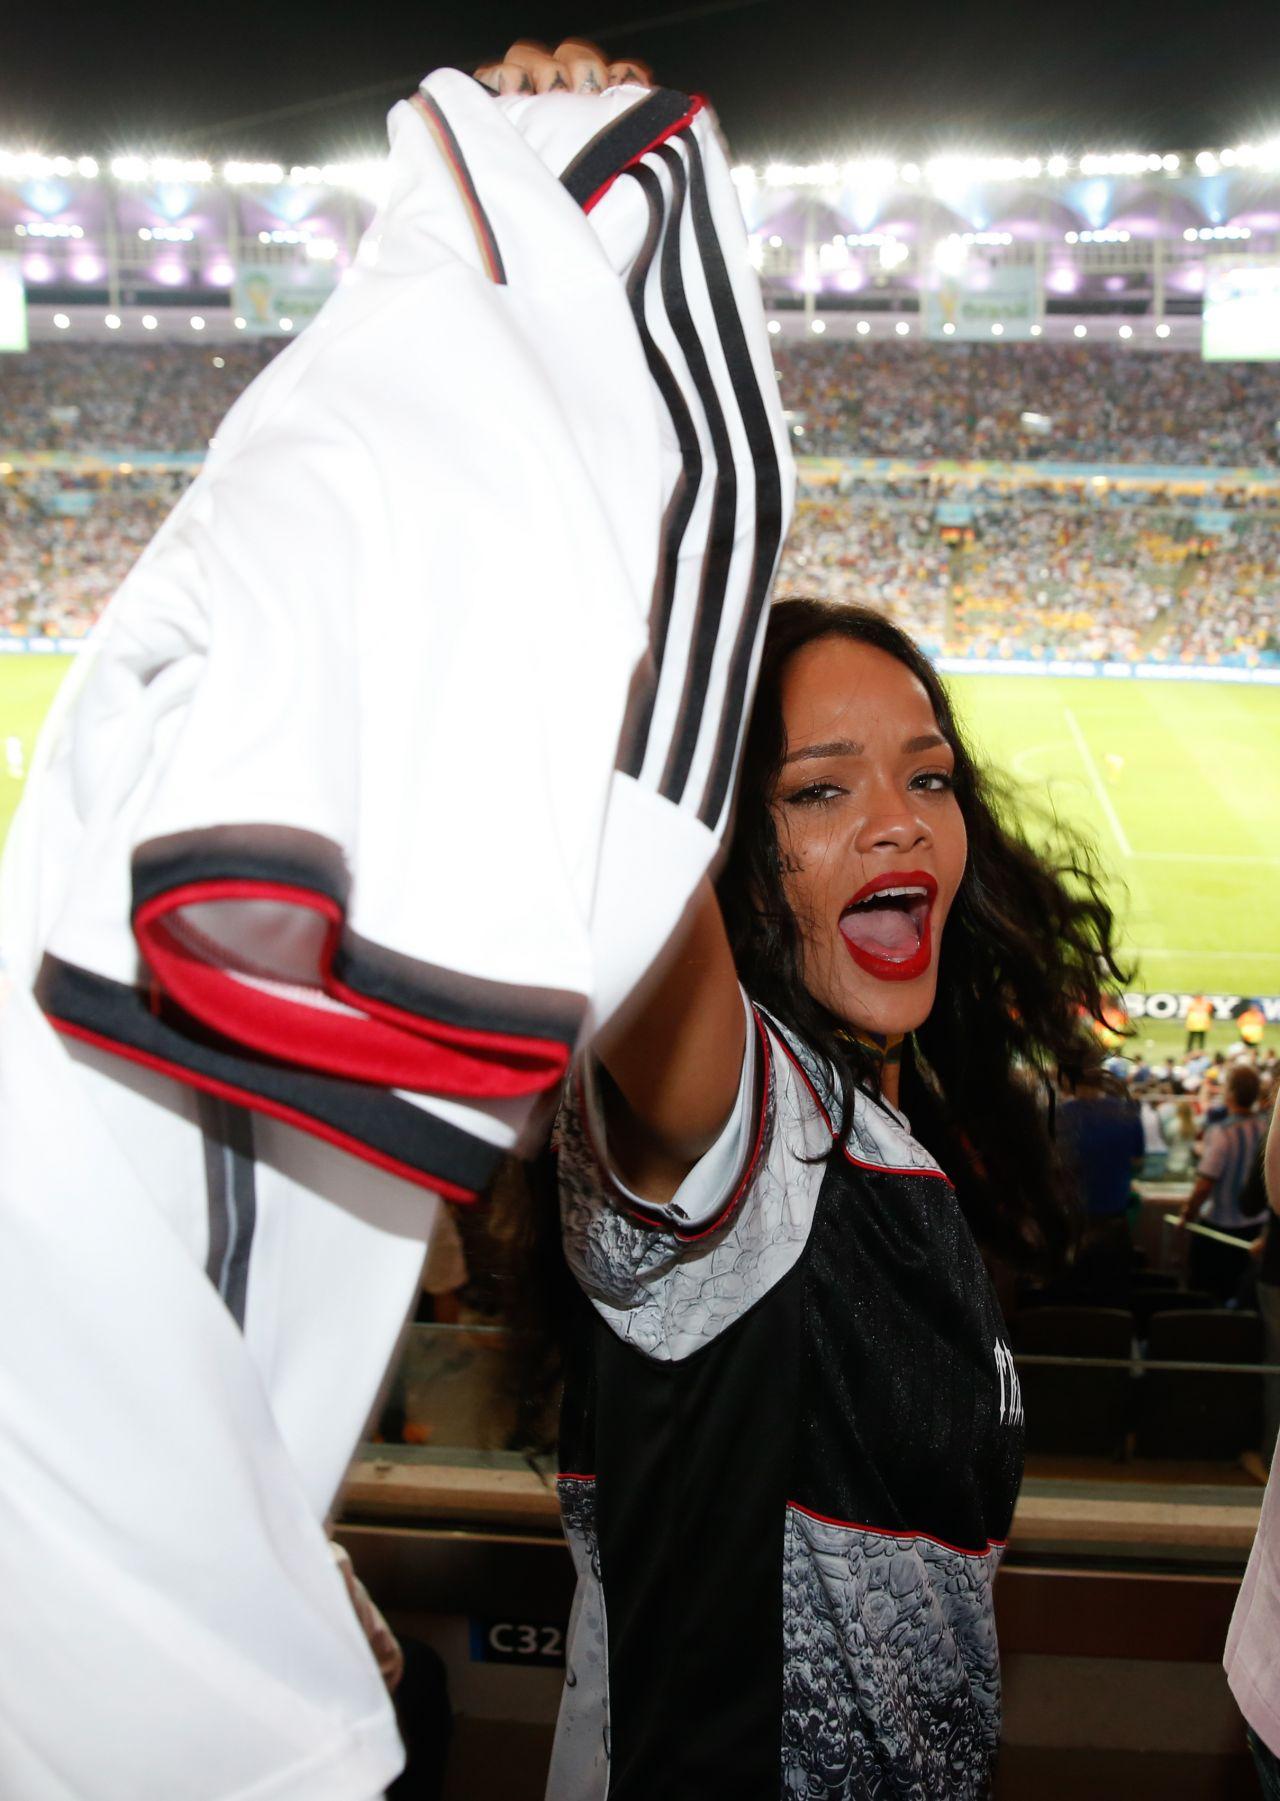 Rihanna - 2014 FIFA World Cup Final at Maracana Stadium, Rio de Janeiro